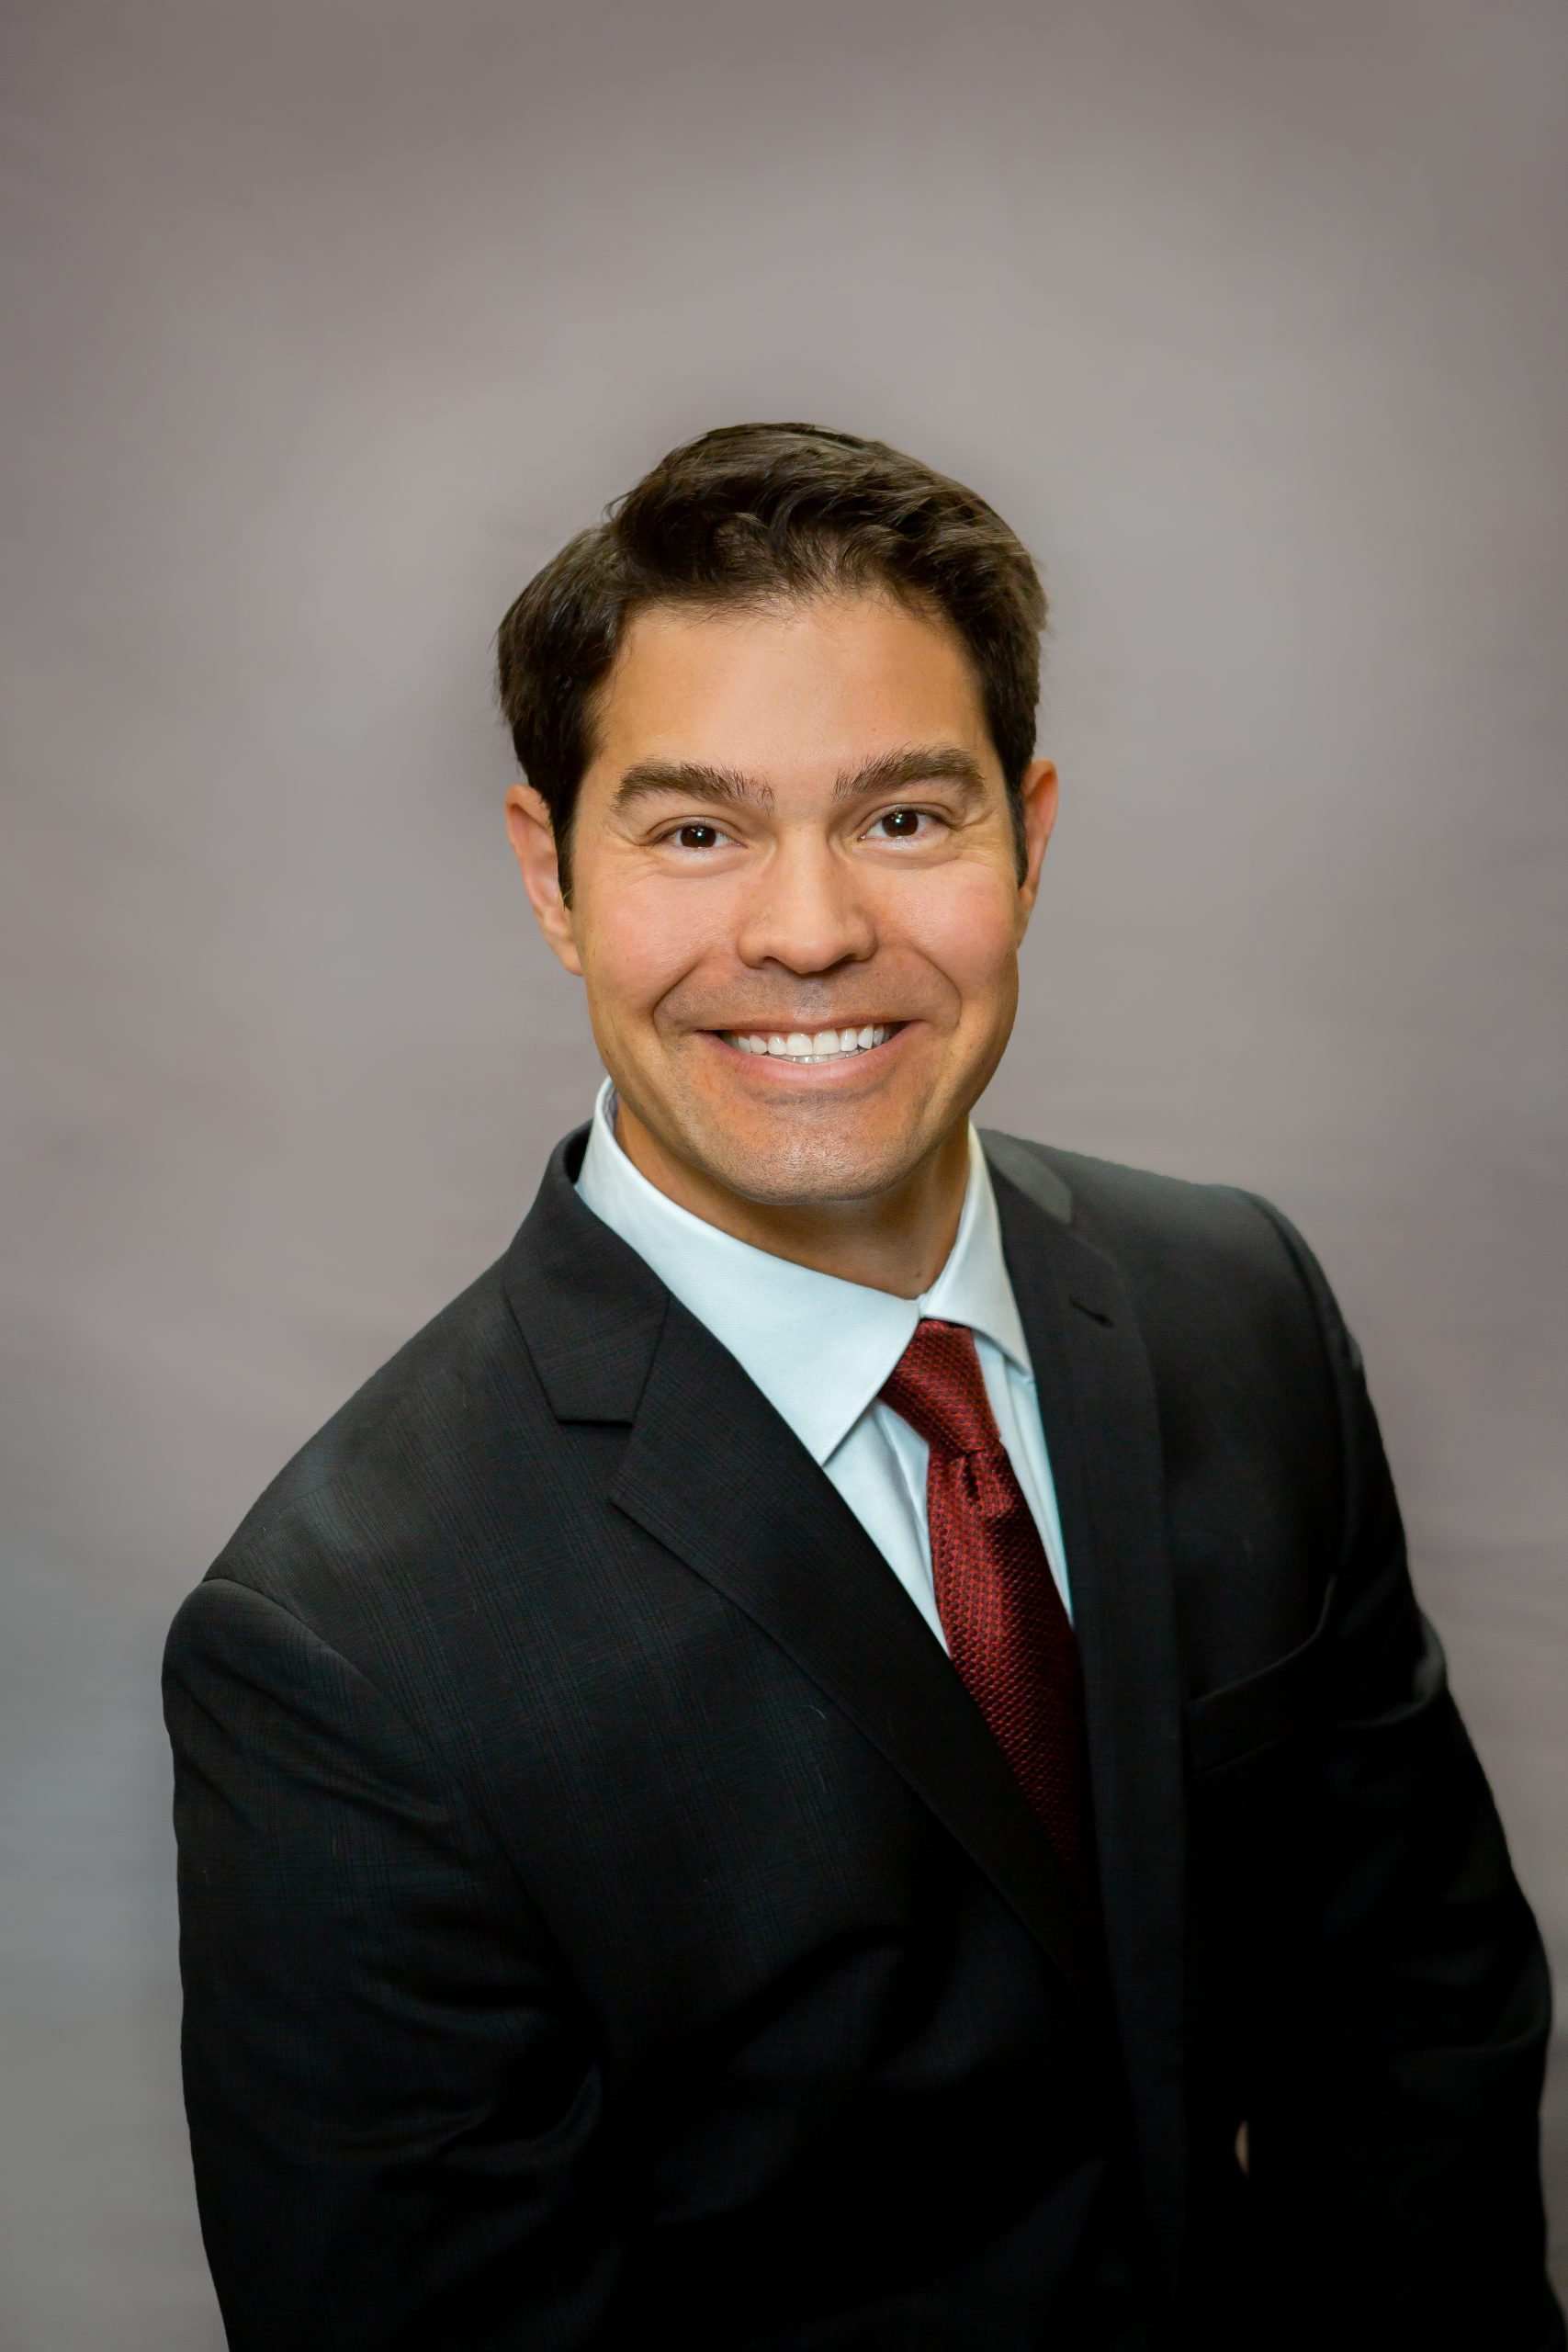 2nd Vice President: Blade Stiller : Commercial Lender - First Federal Bank & Trust